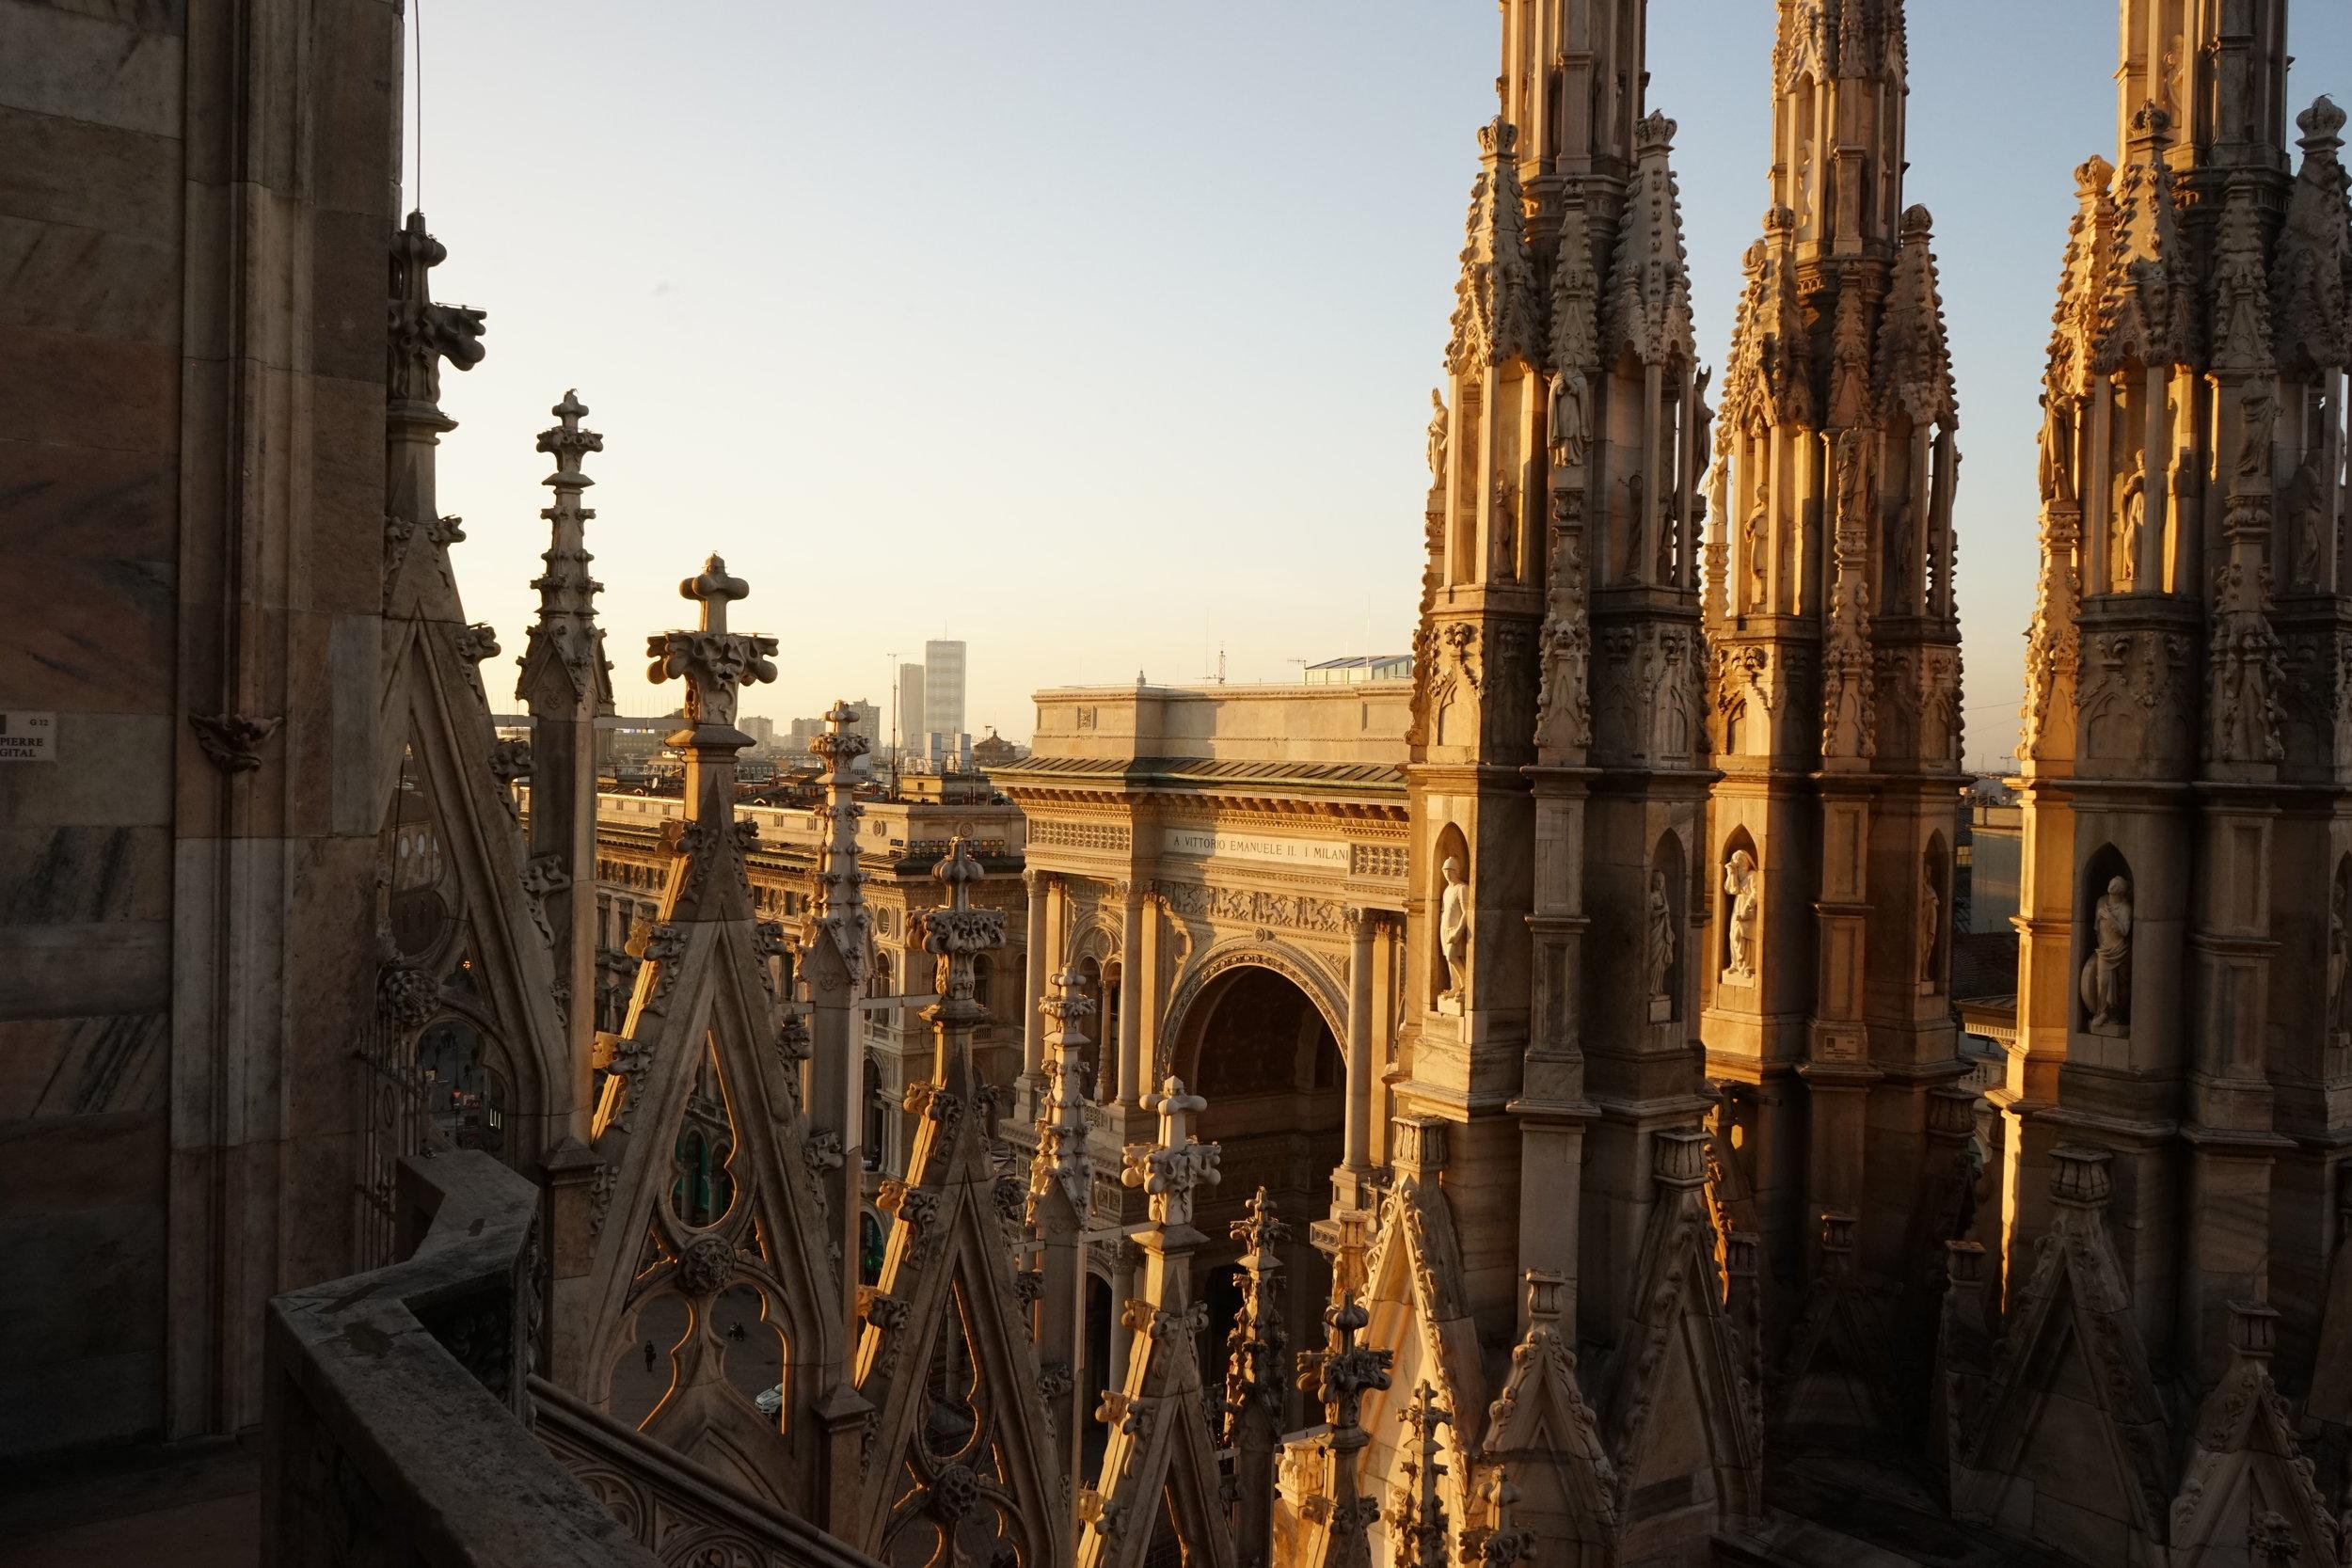 On Top Of Duomo next to the Clouds Model David topmodel lundin-03.jpg